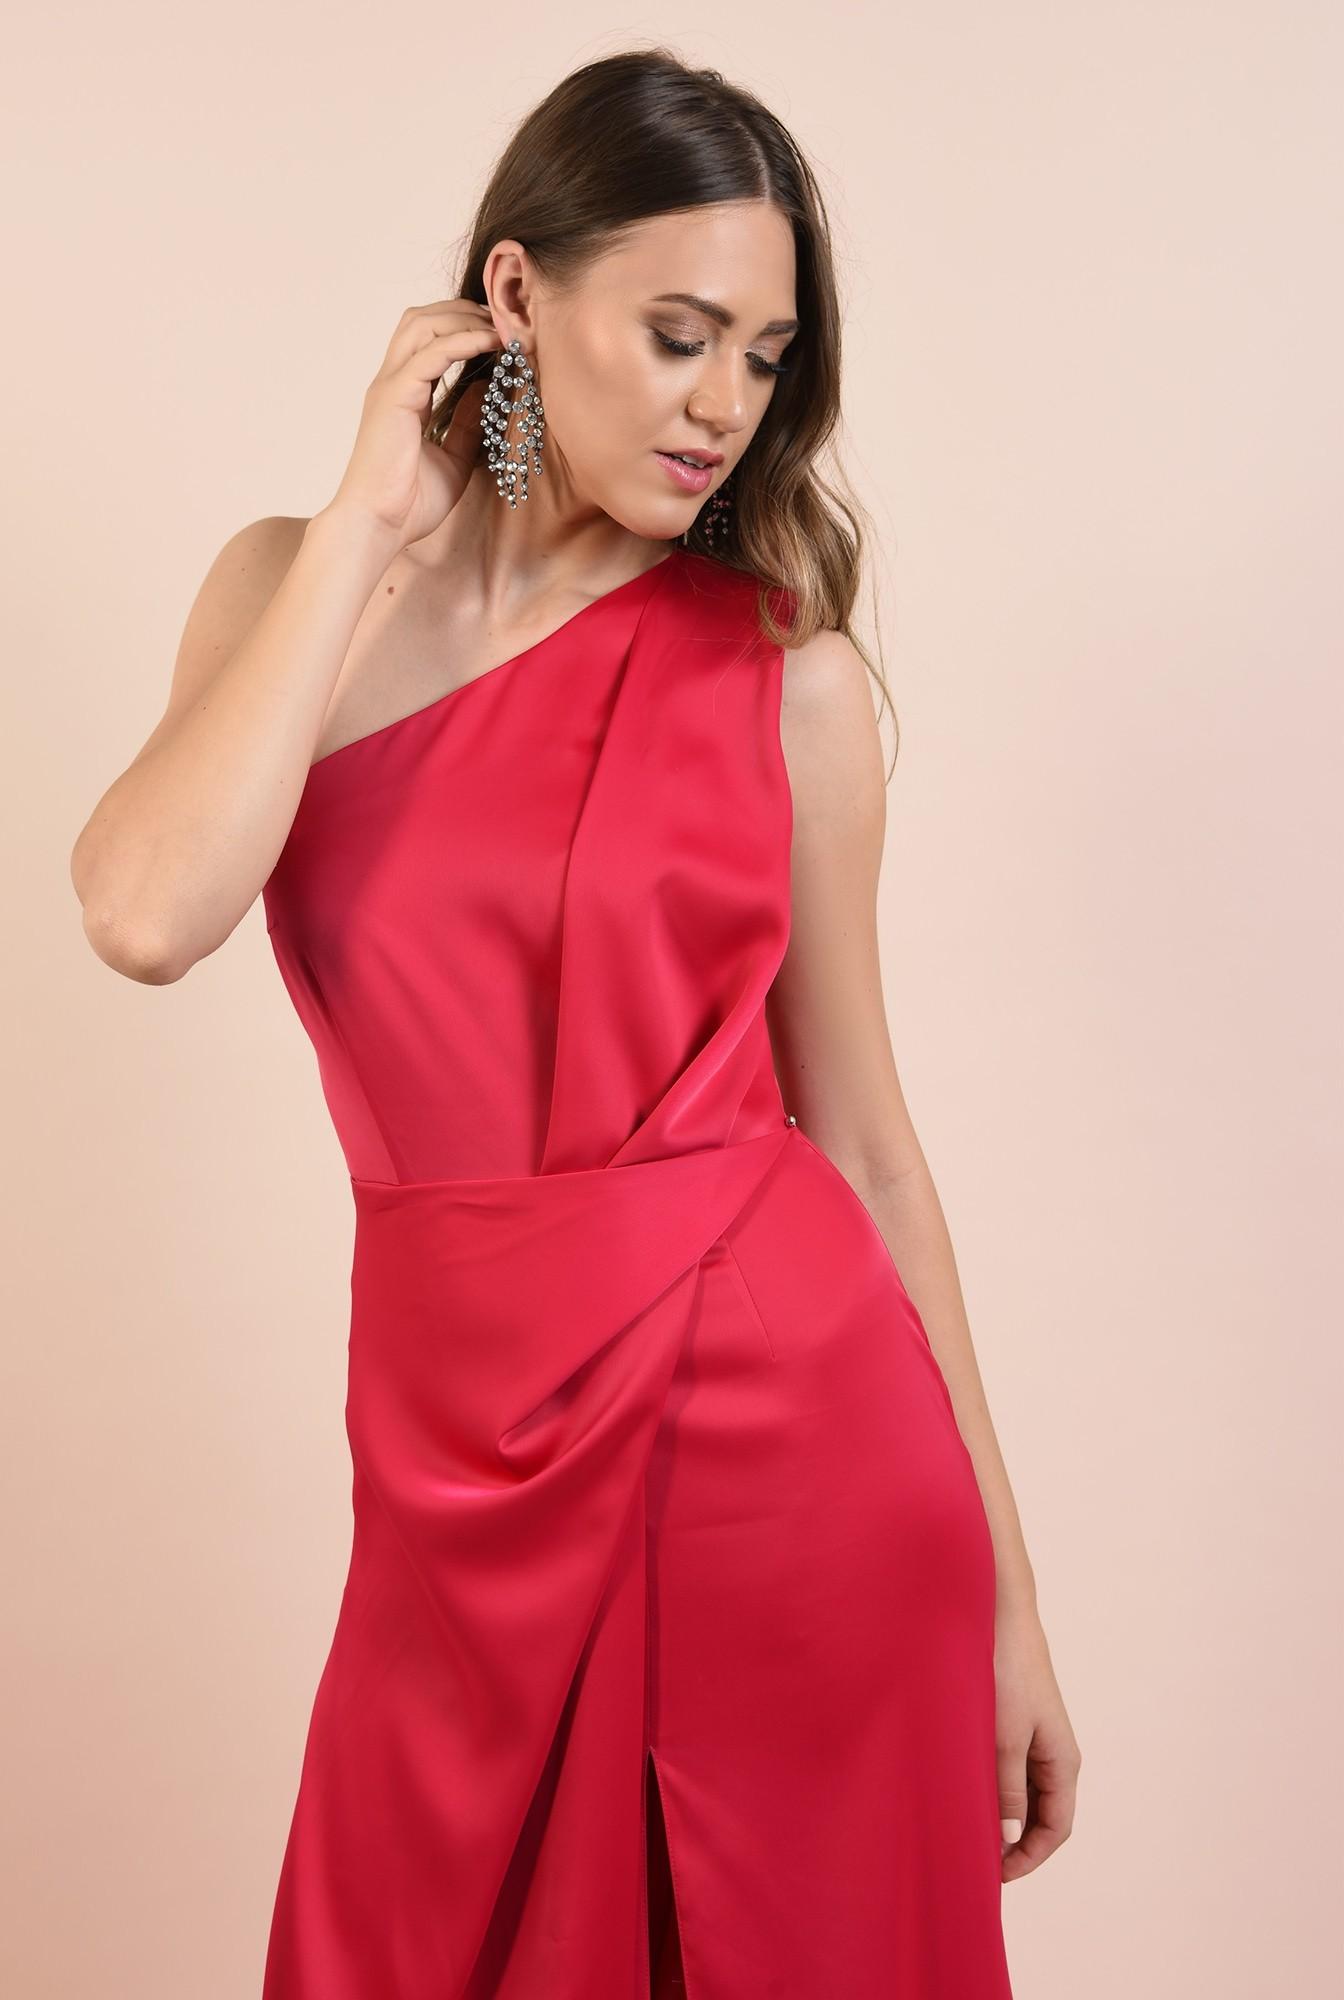 2 - rochie eleganta, lunga, cu slit adanc, cusatura in talie